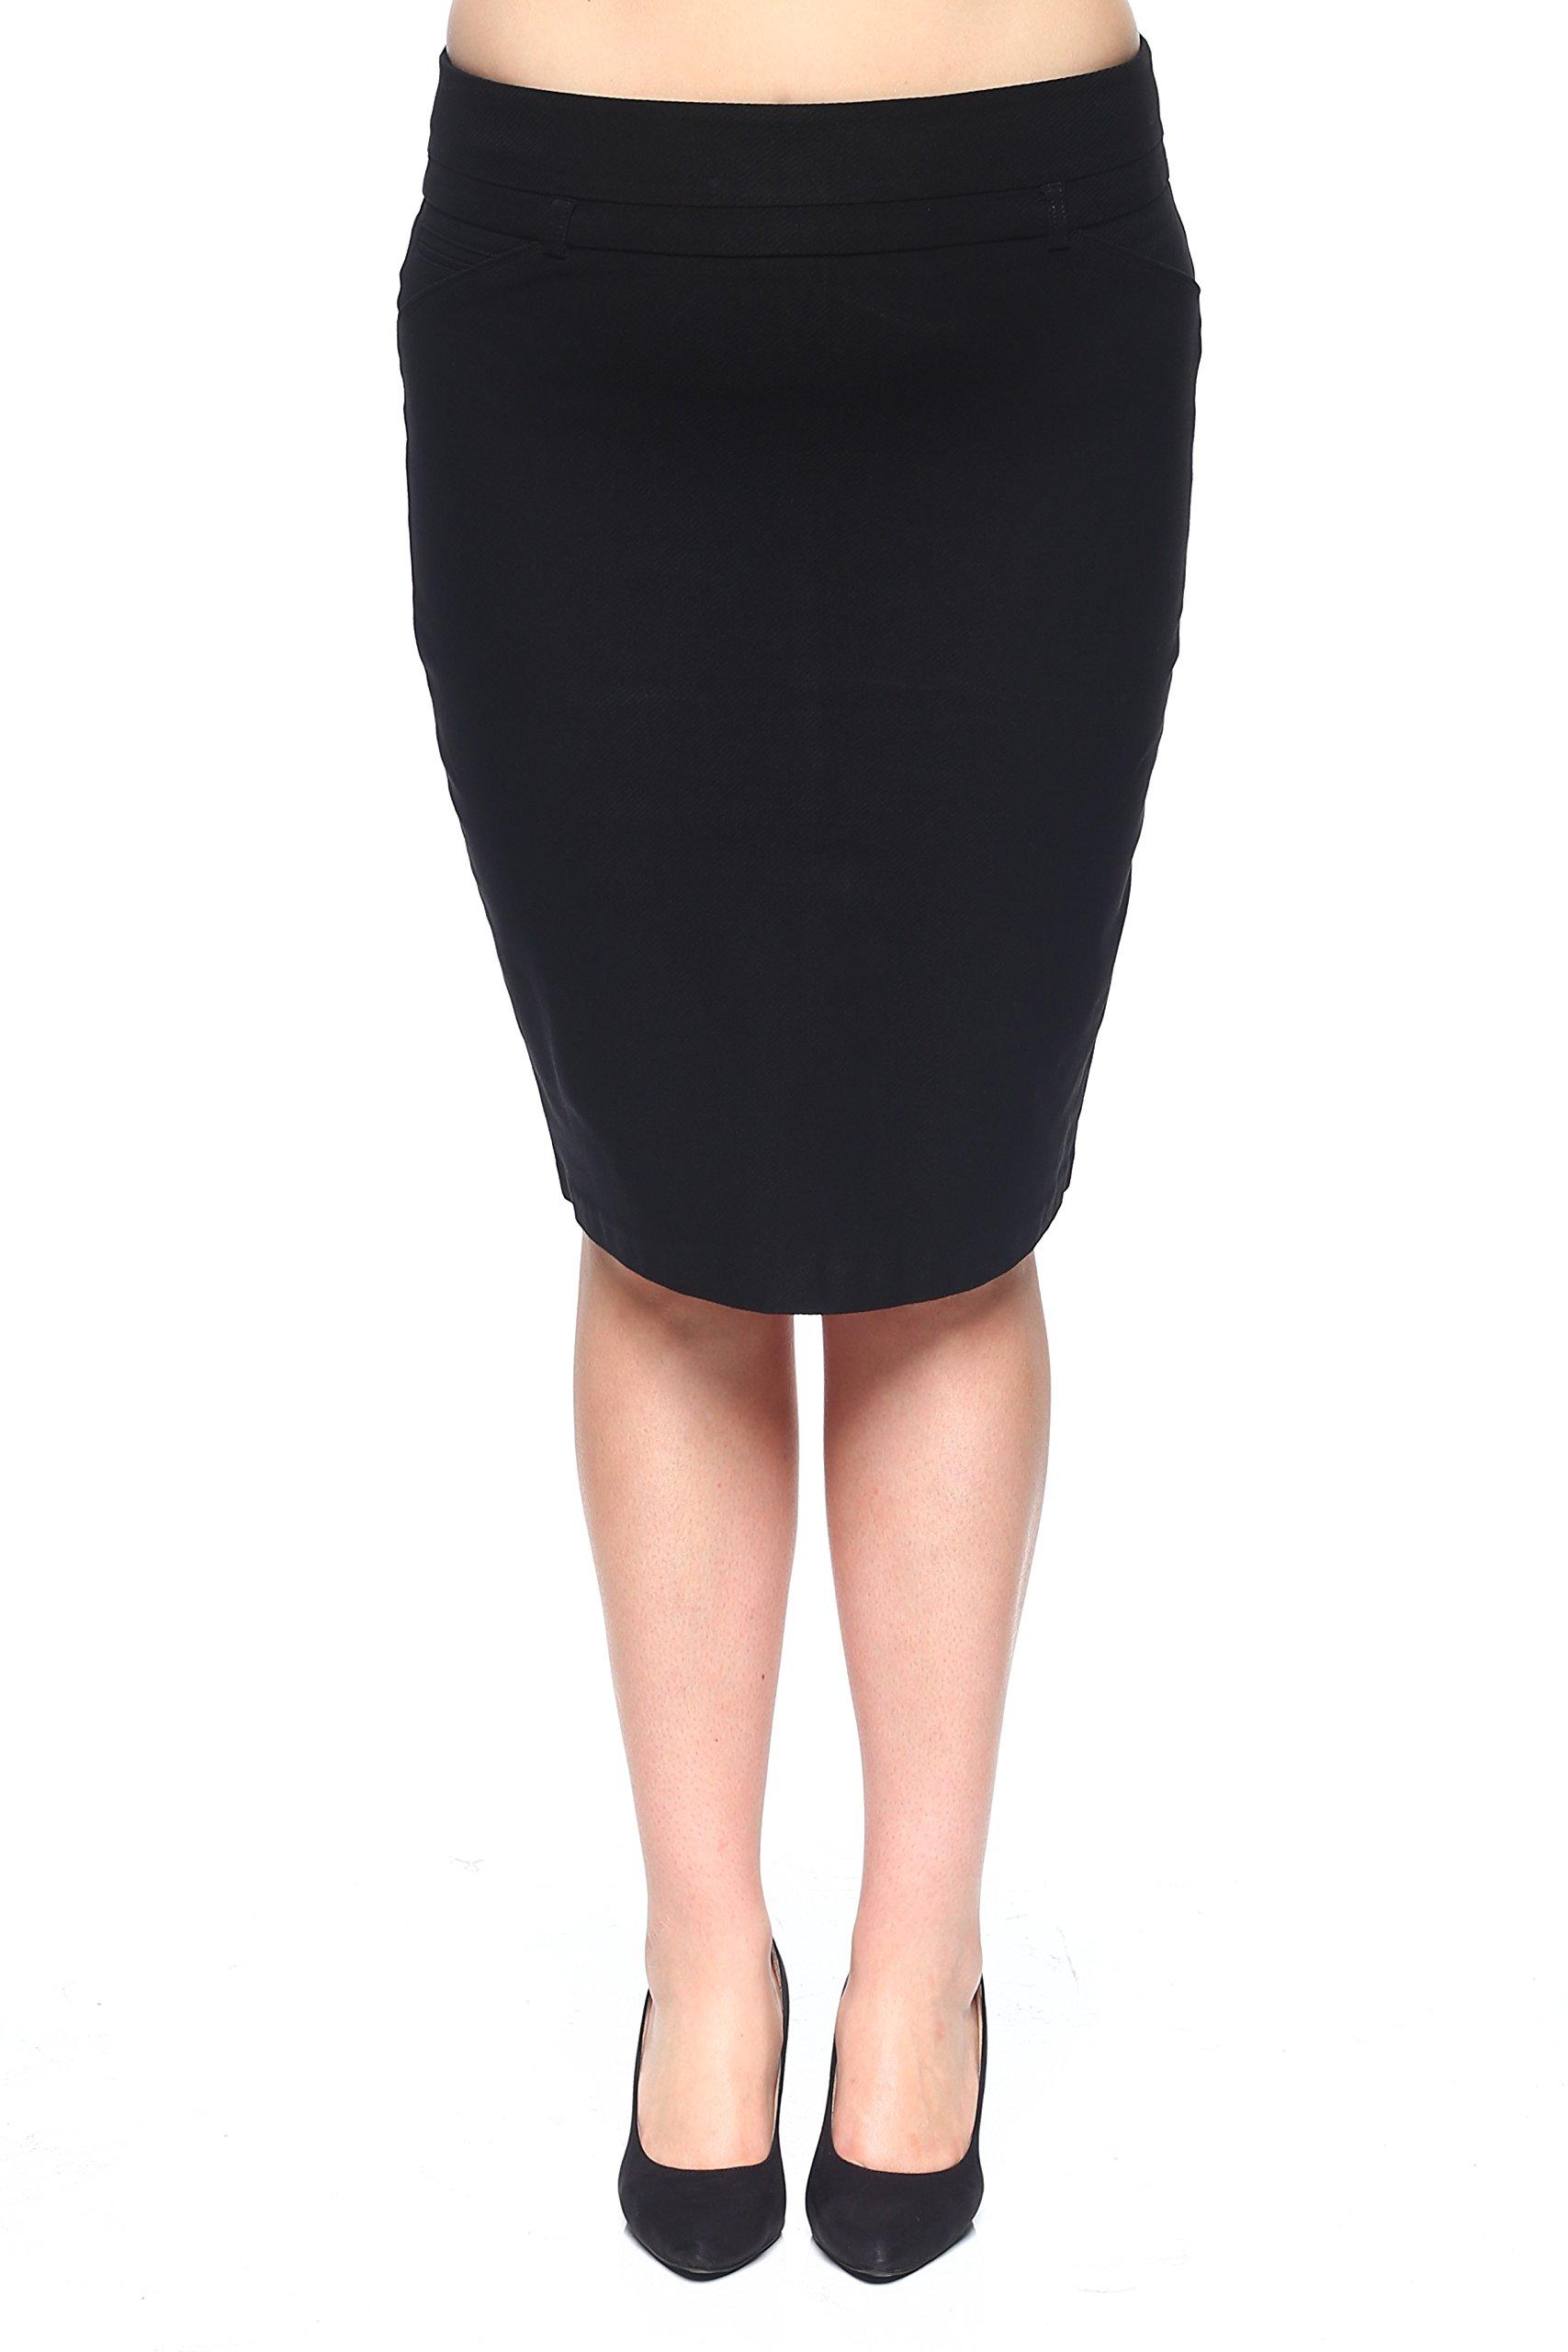 Rokoko Women's Plus-Size High Waist Midi Knee Office Work Pencil Skirt - 1XL - Black